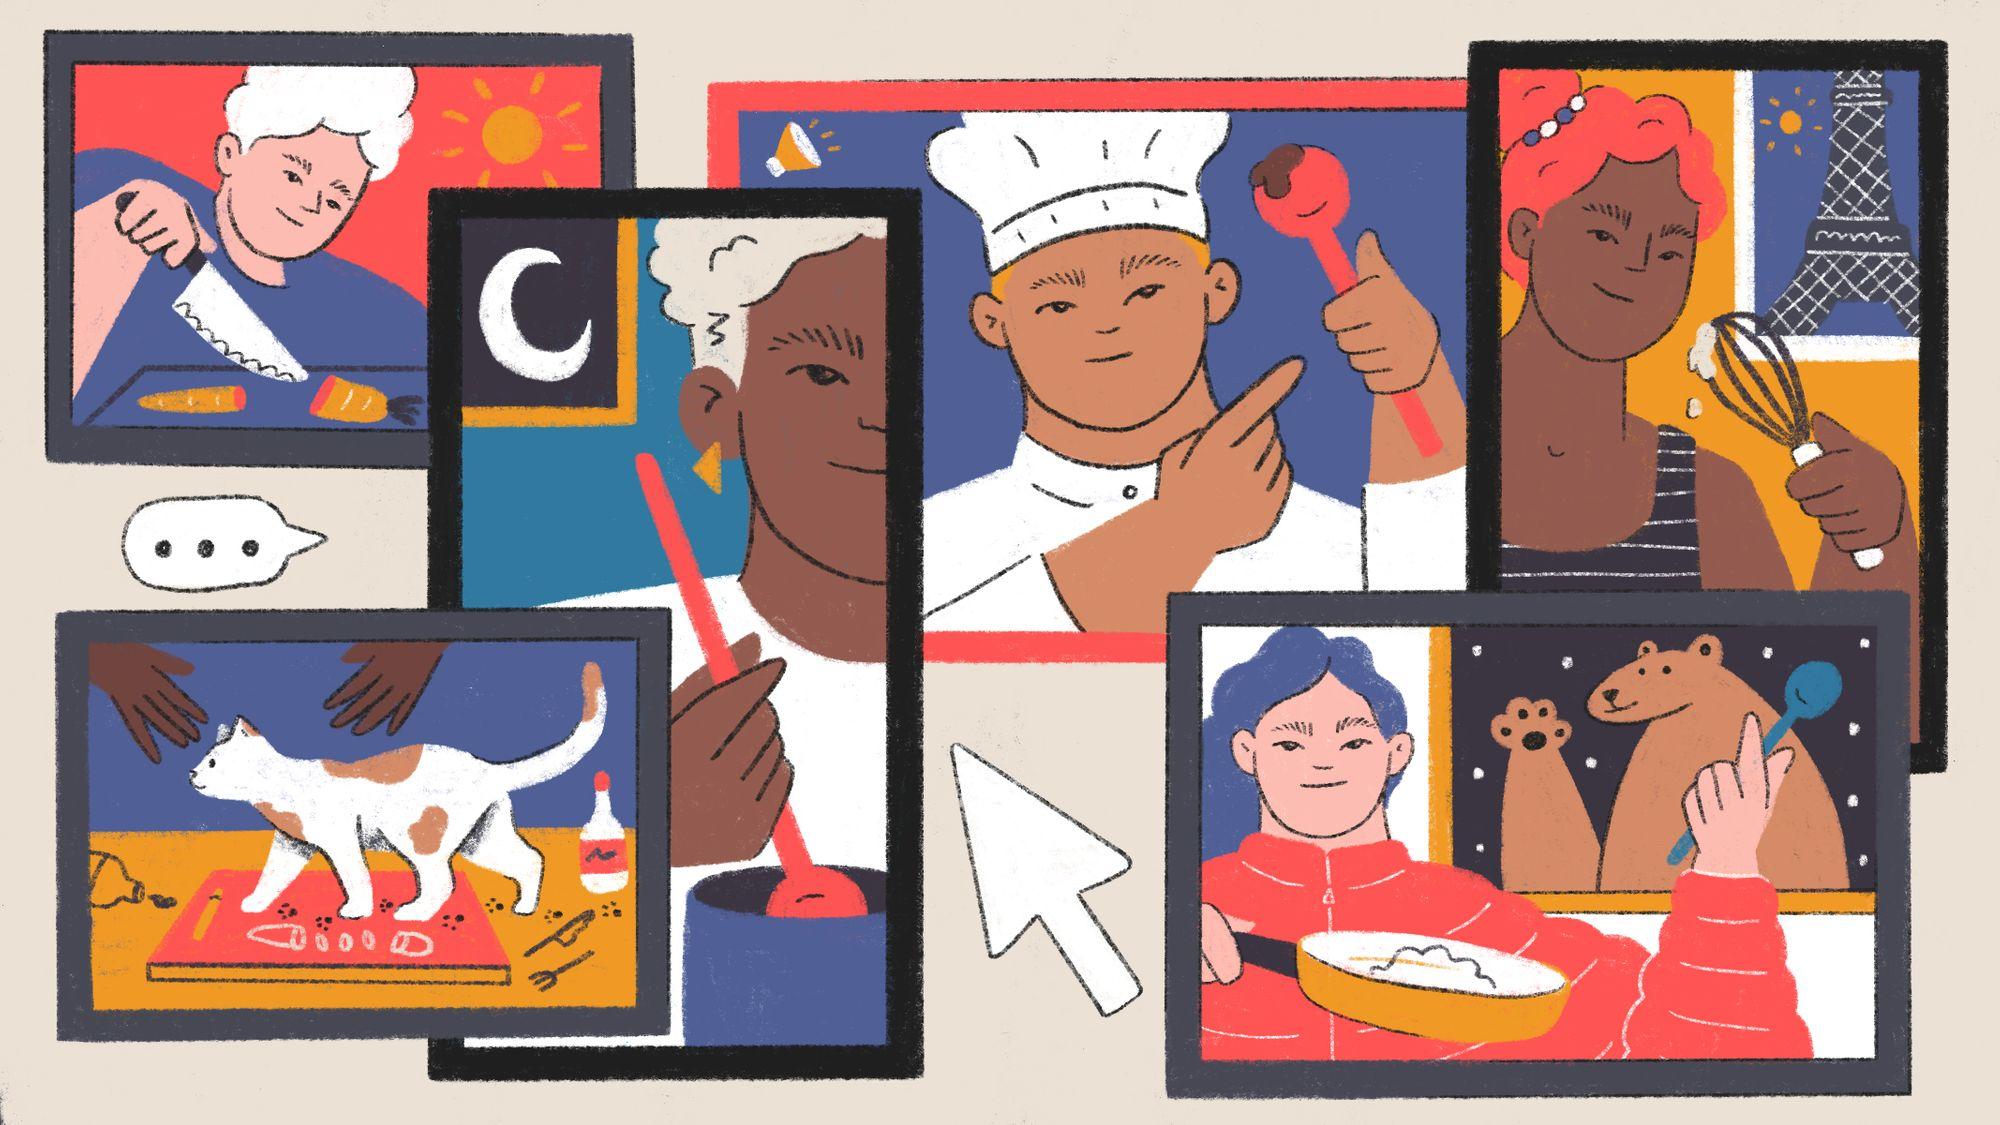 Illustrations by Carmela Caldart